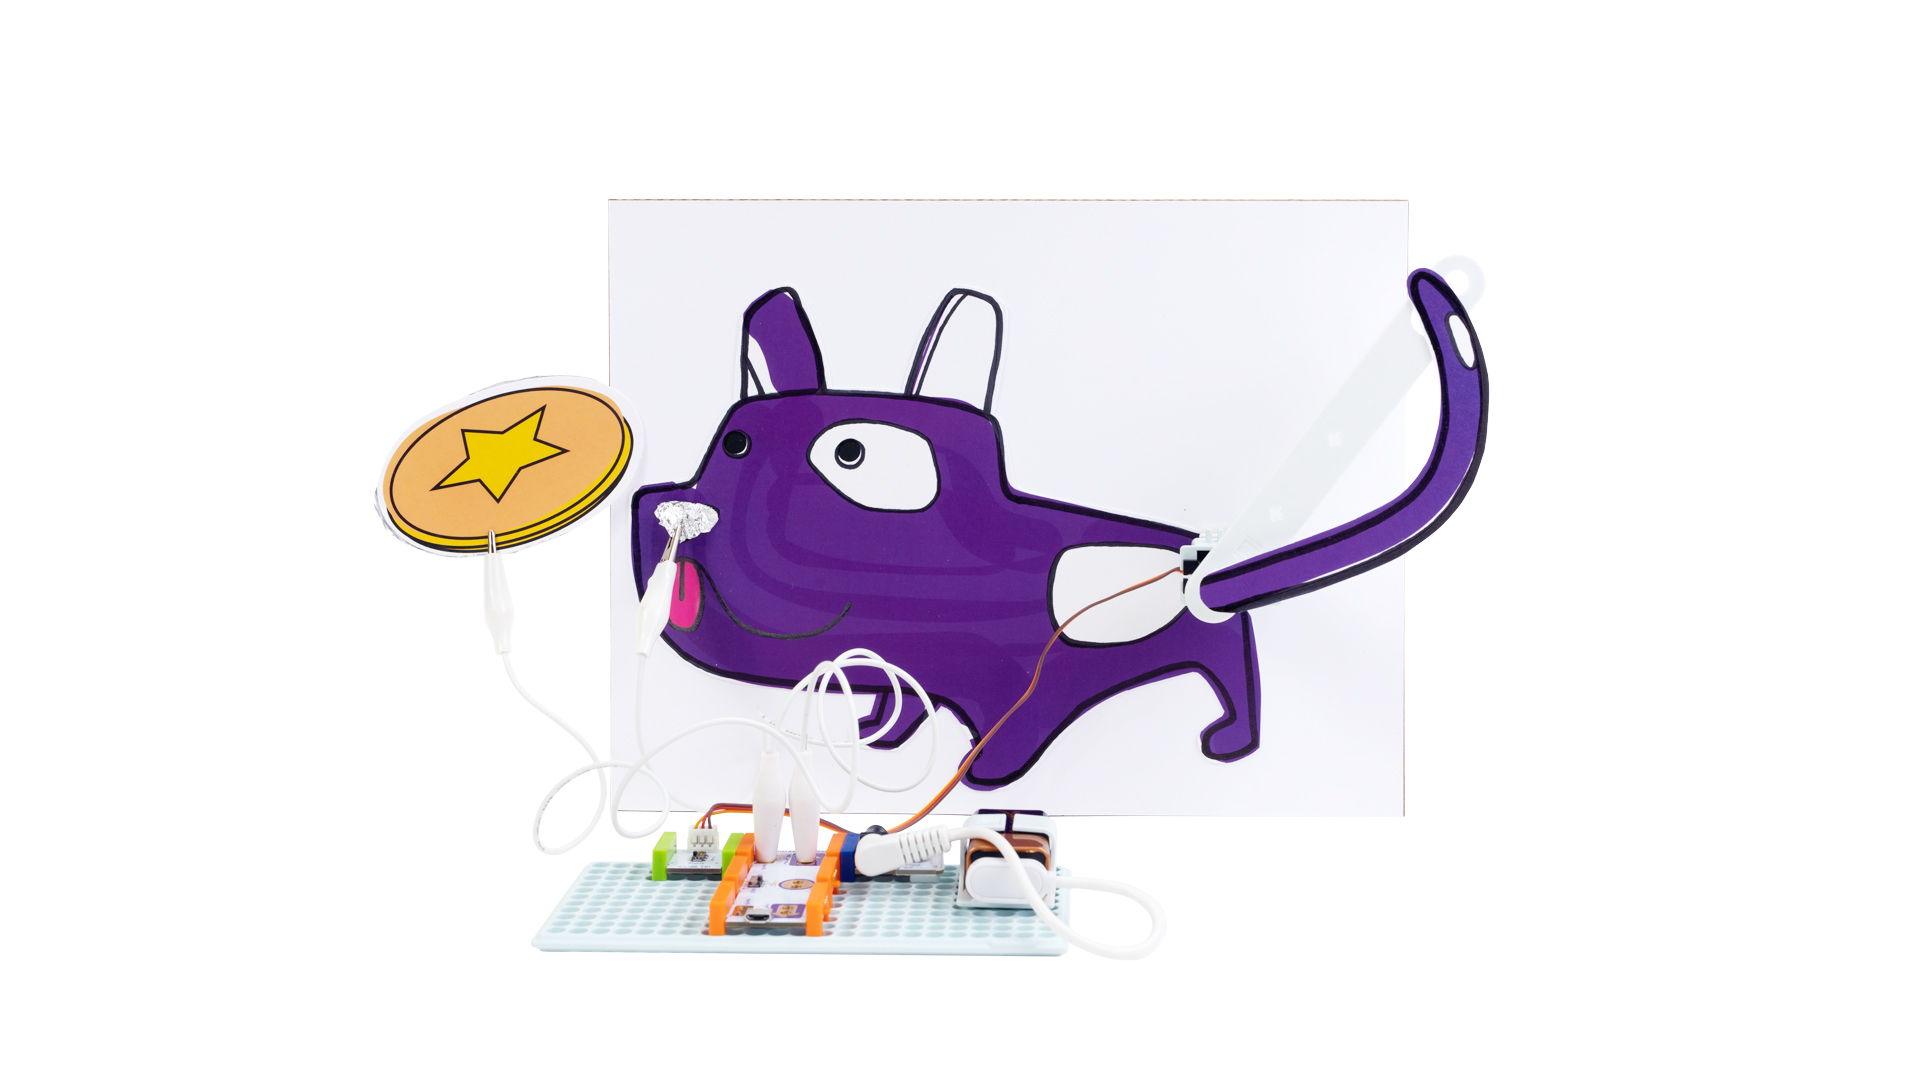 expansion packs, littleBits, invention, STEAM Student Set